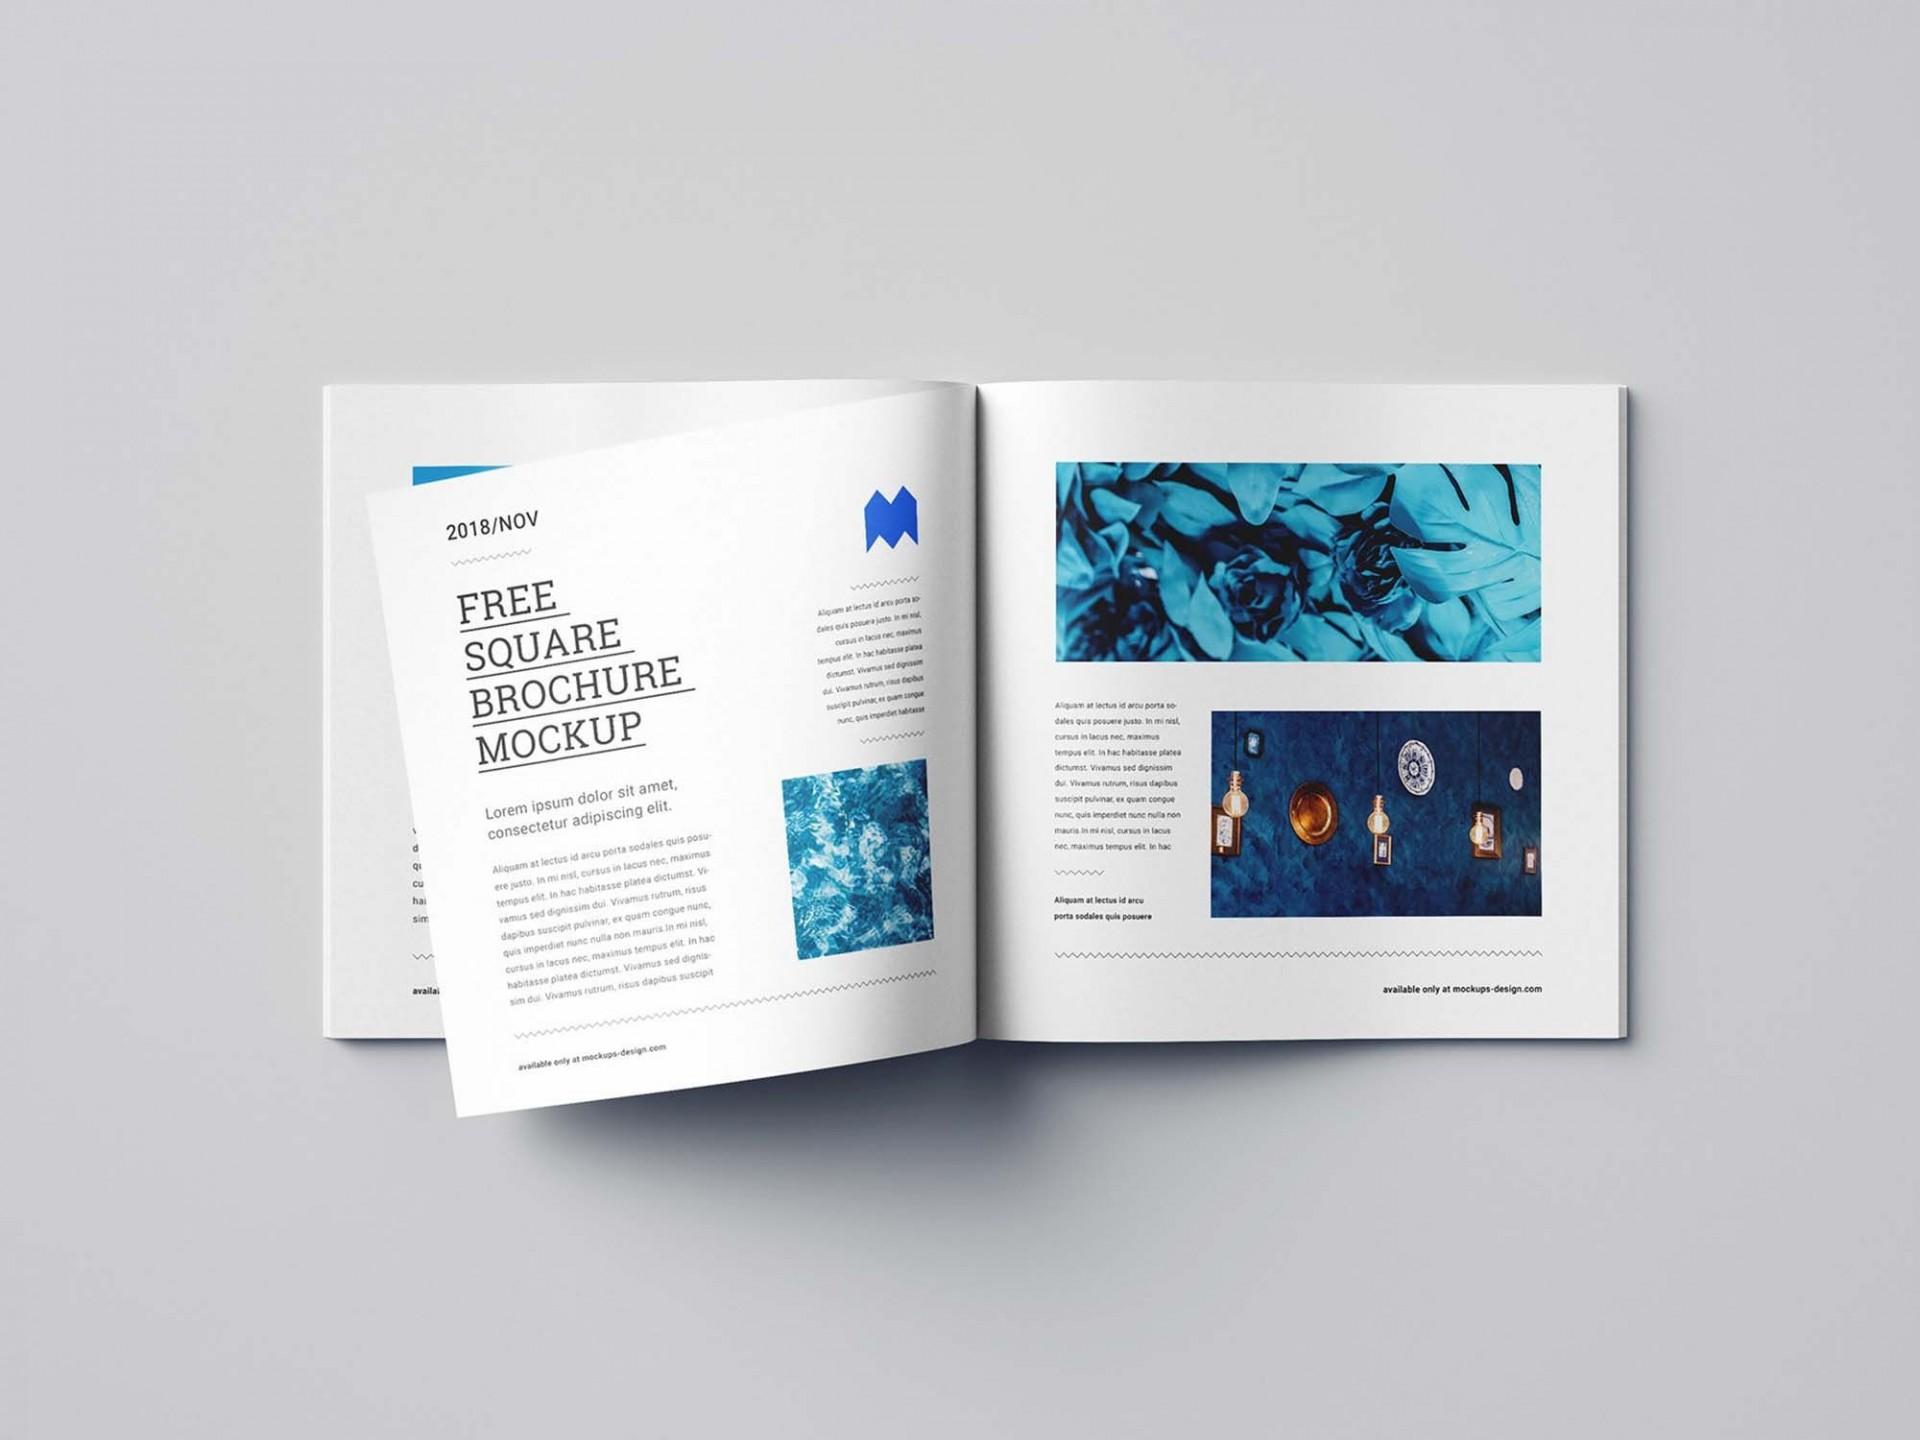 007 Fantastic Square Brochure Template Psd Free Download Idea 1920